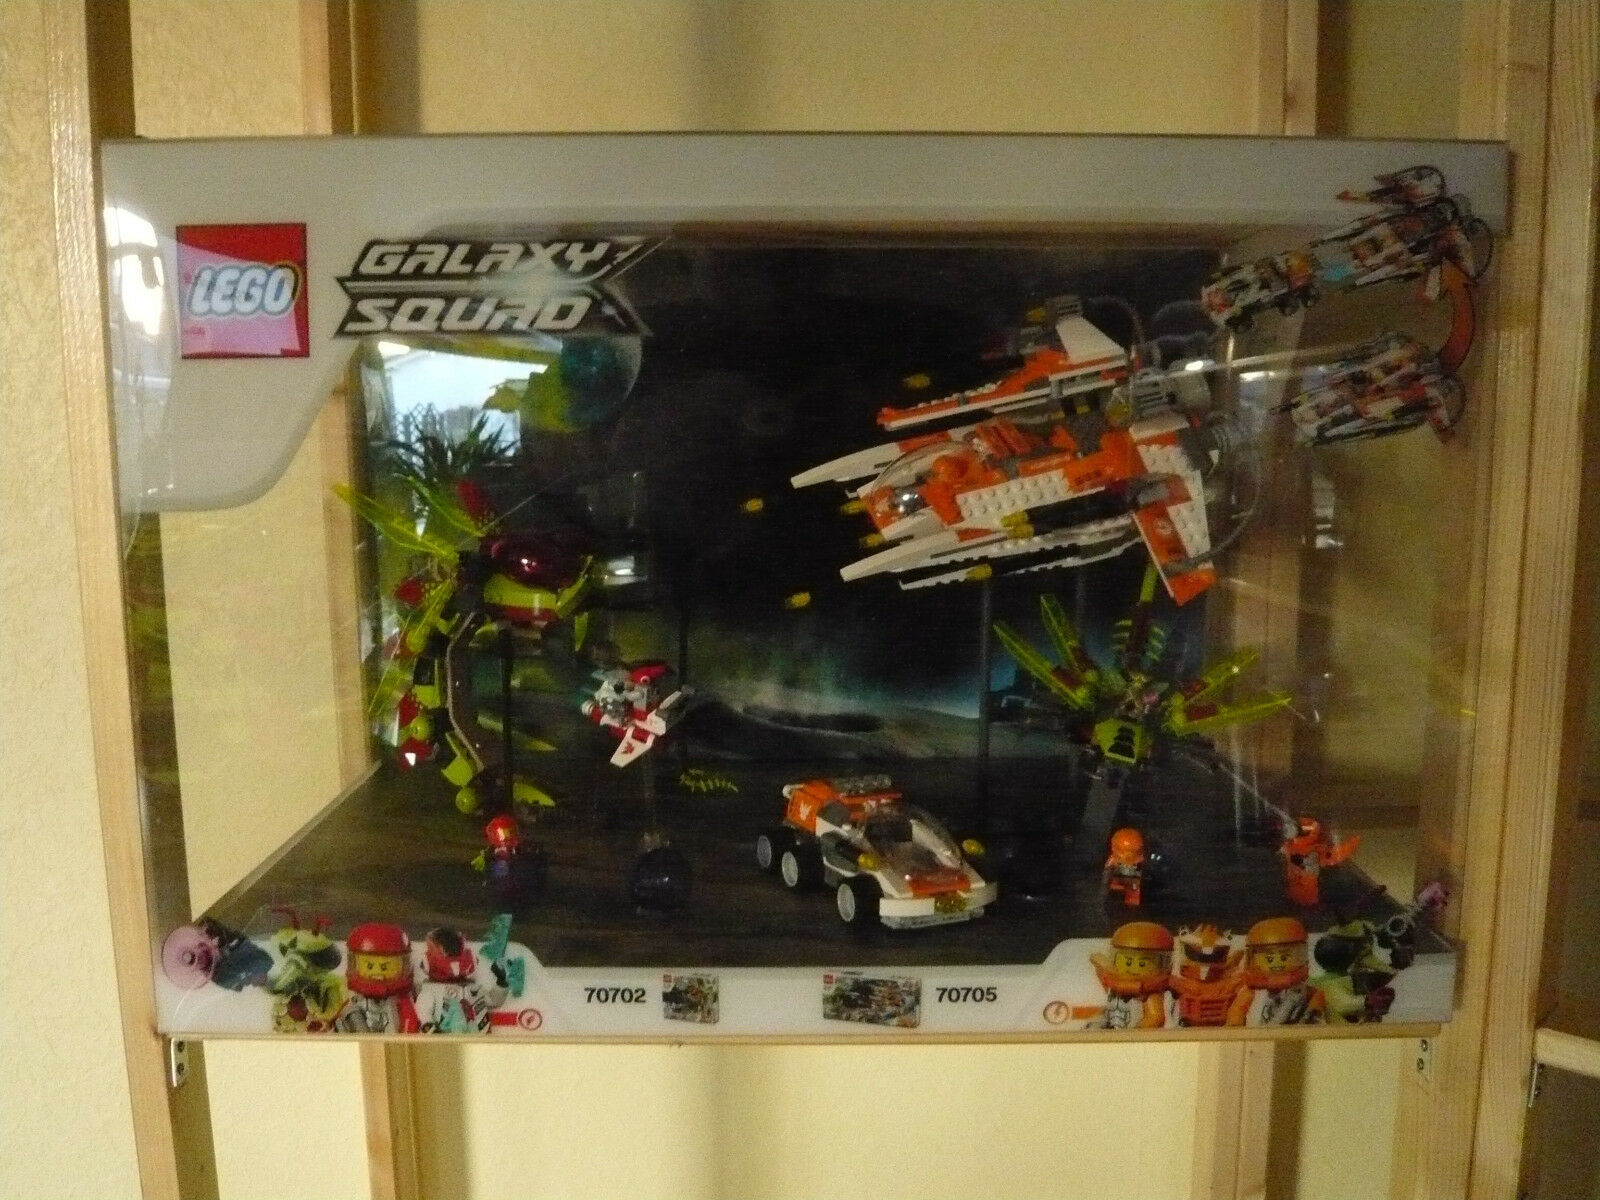 LEGO - Schaukasten - Galaxy Squad - Art.70702   Art.70705 - Showcase